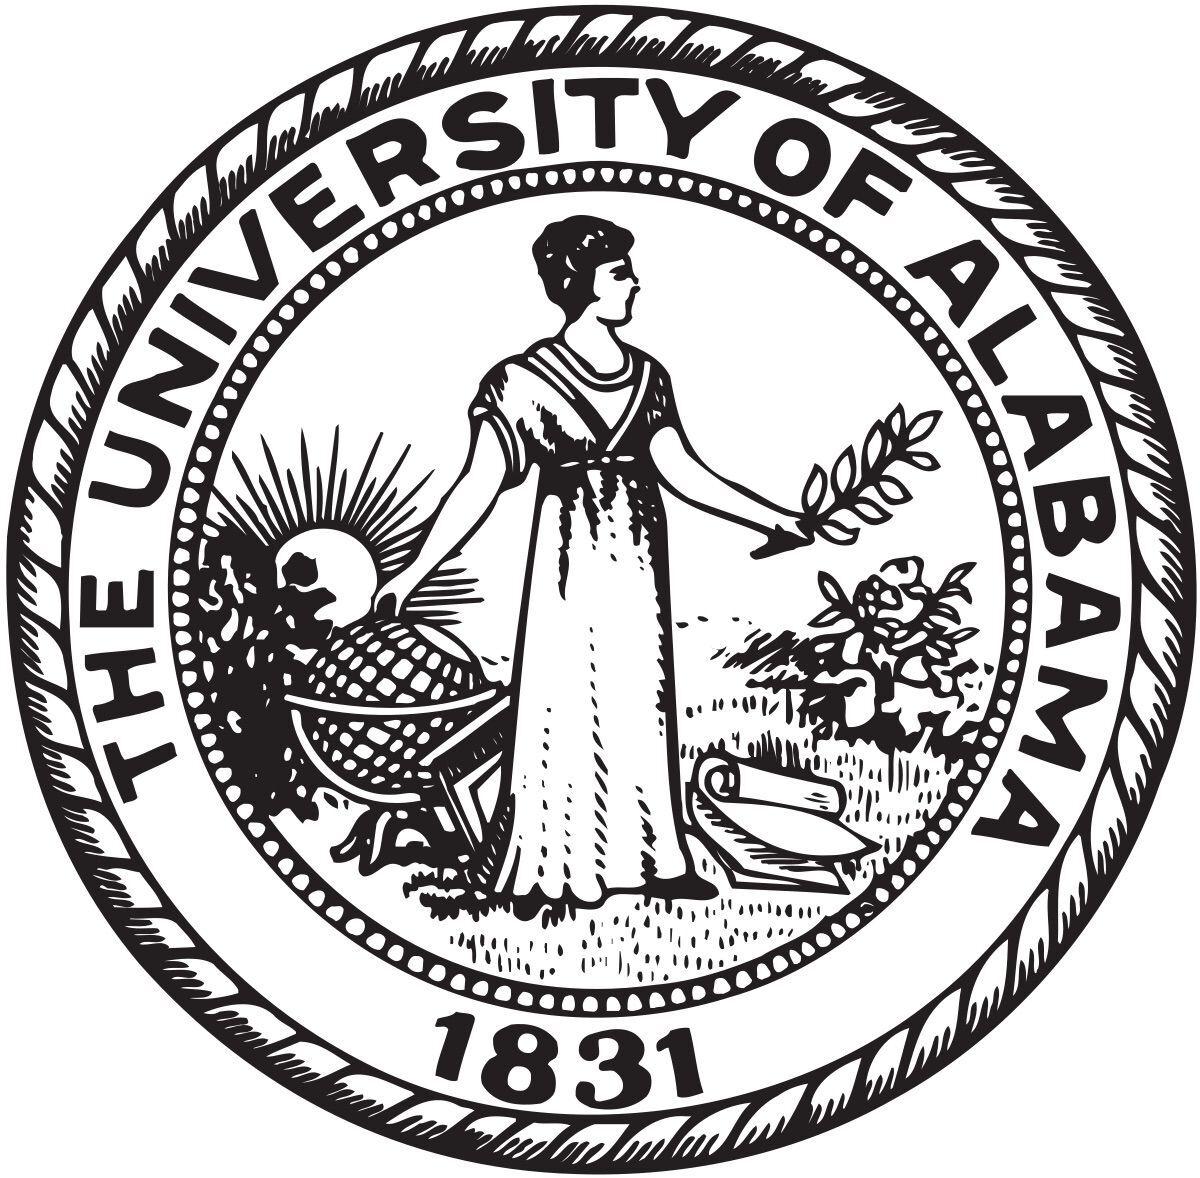 University of Alabama seal